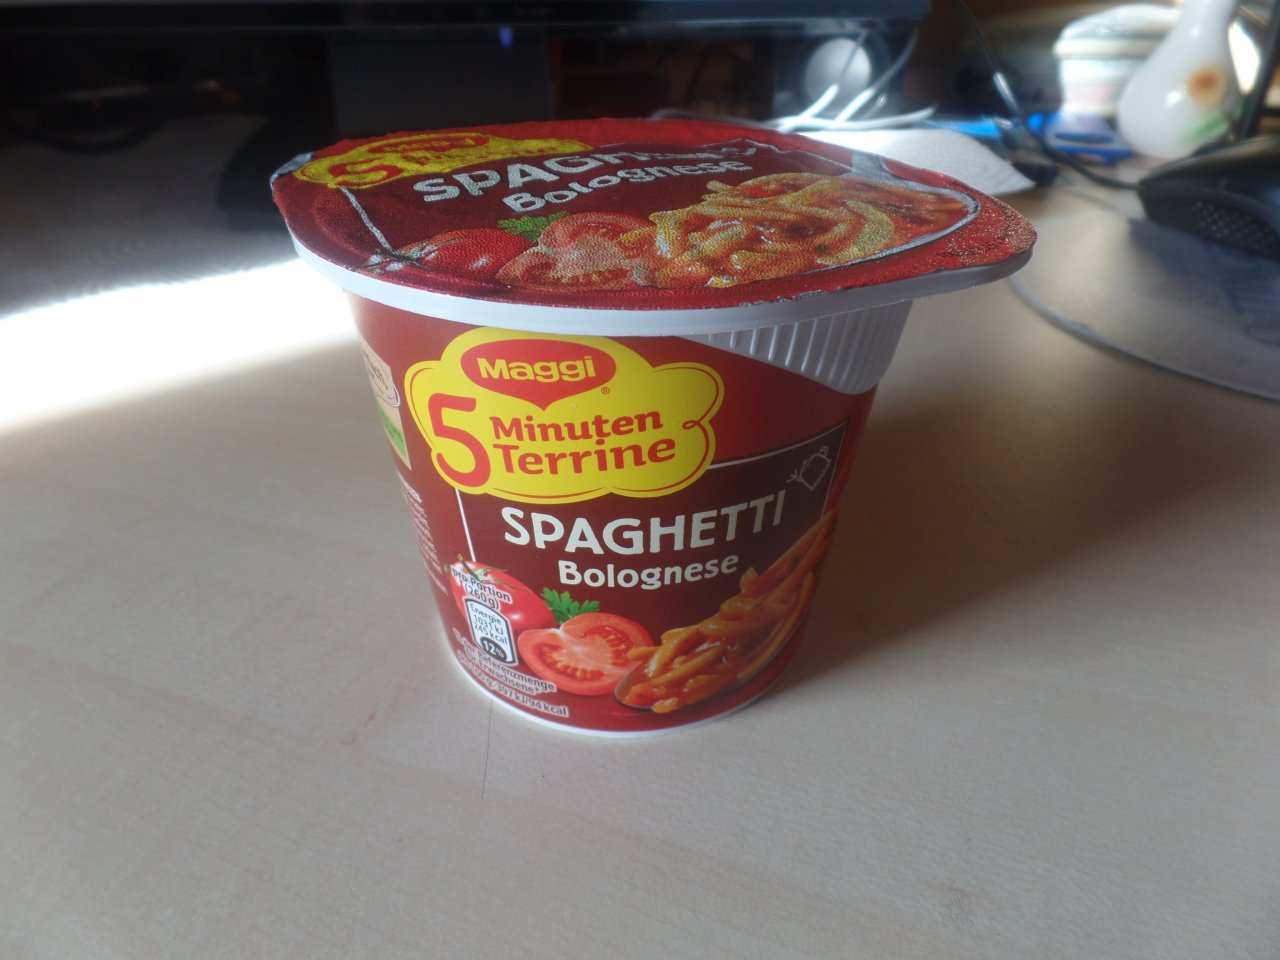 "#1501: Maggi 5 Minuten Terrine ""Spaghetti Bolognese"" (2019)"